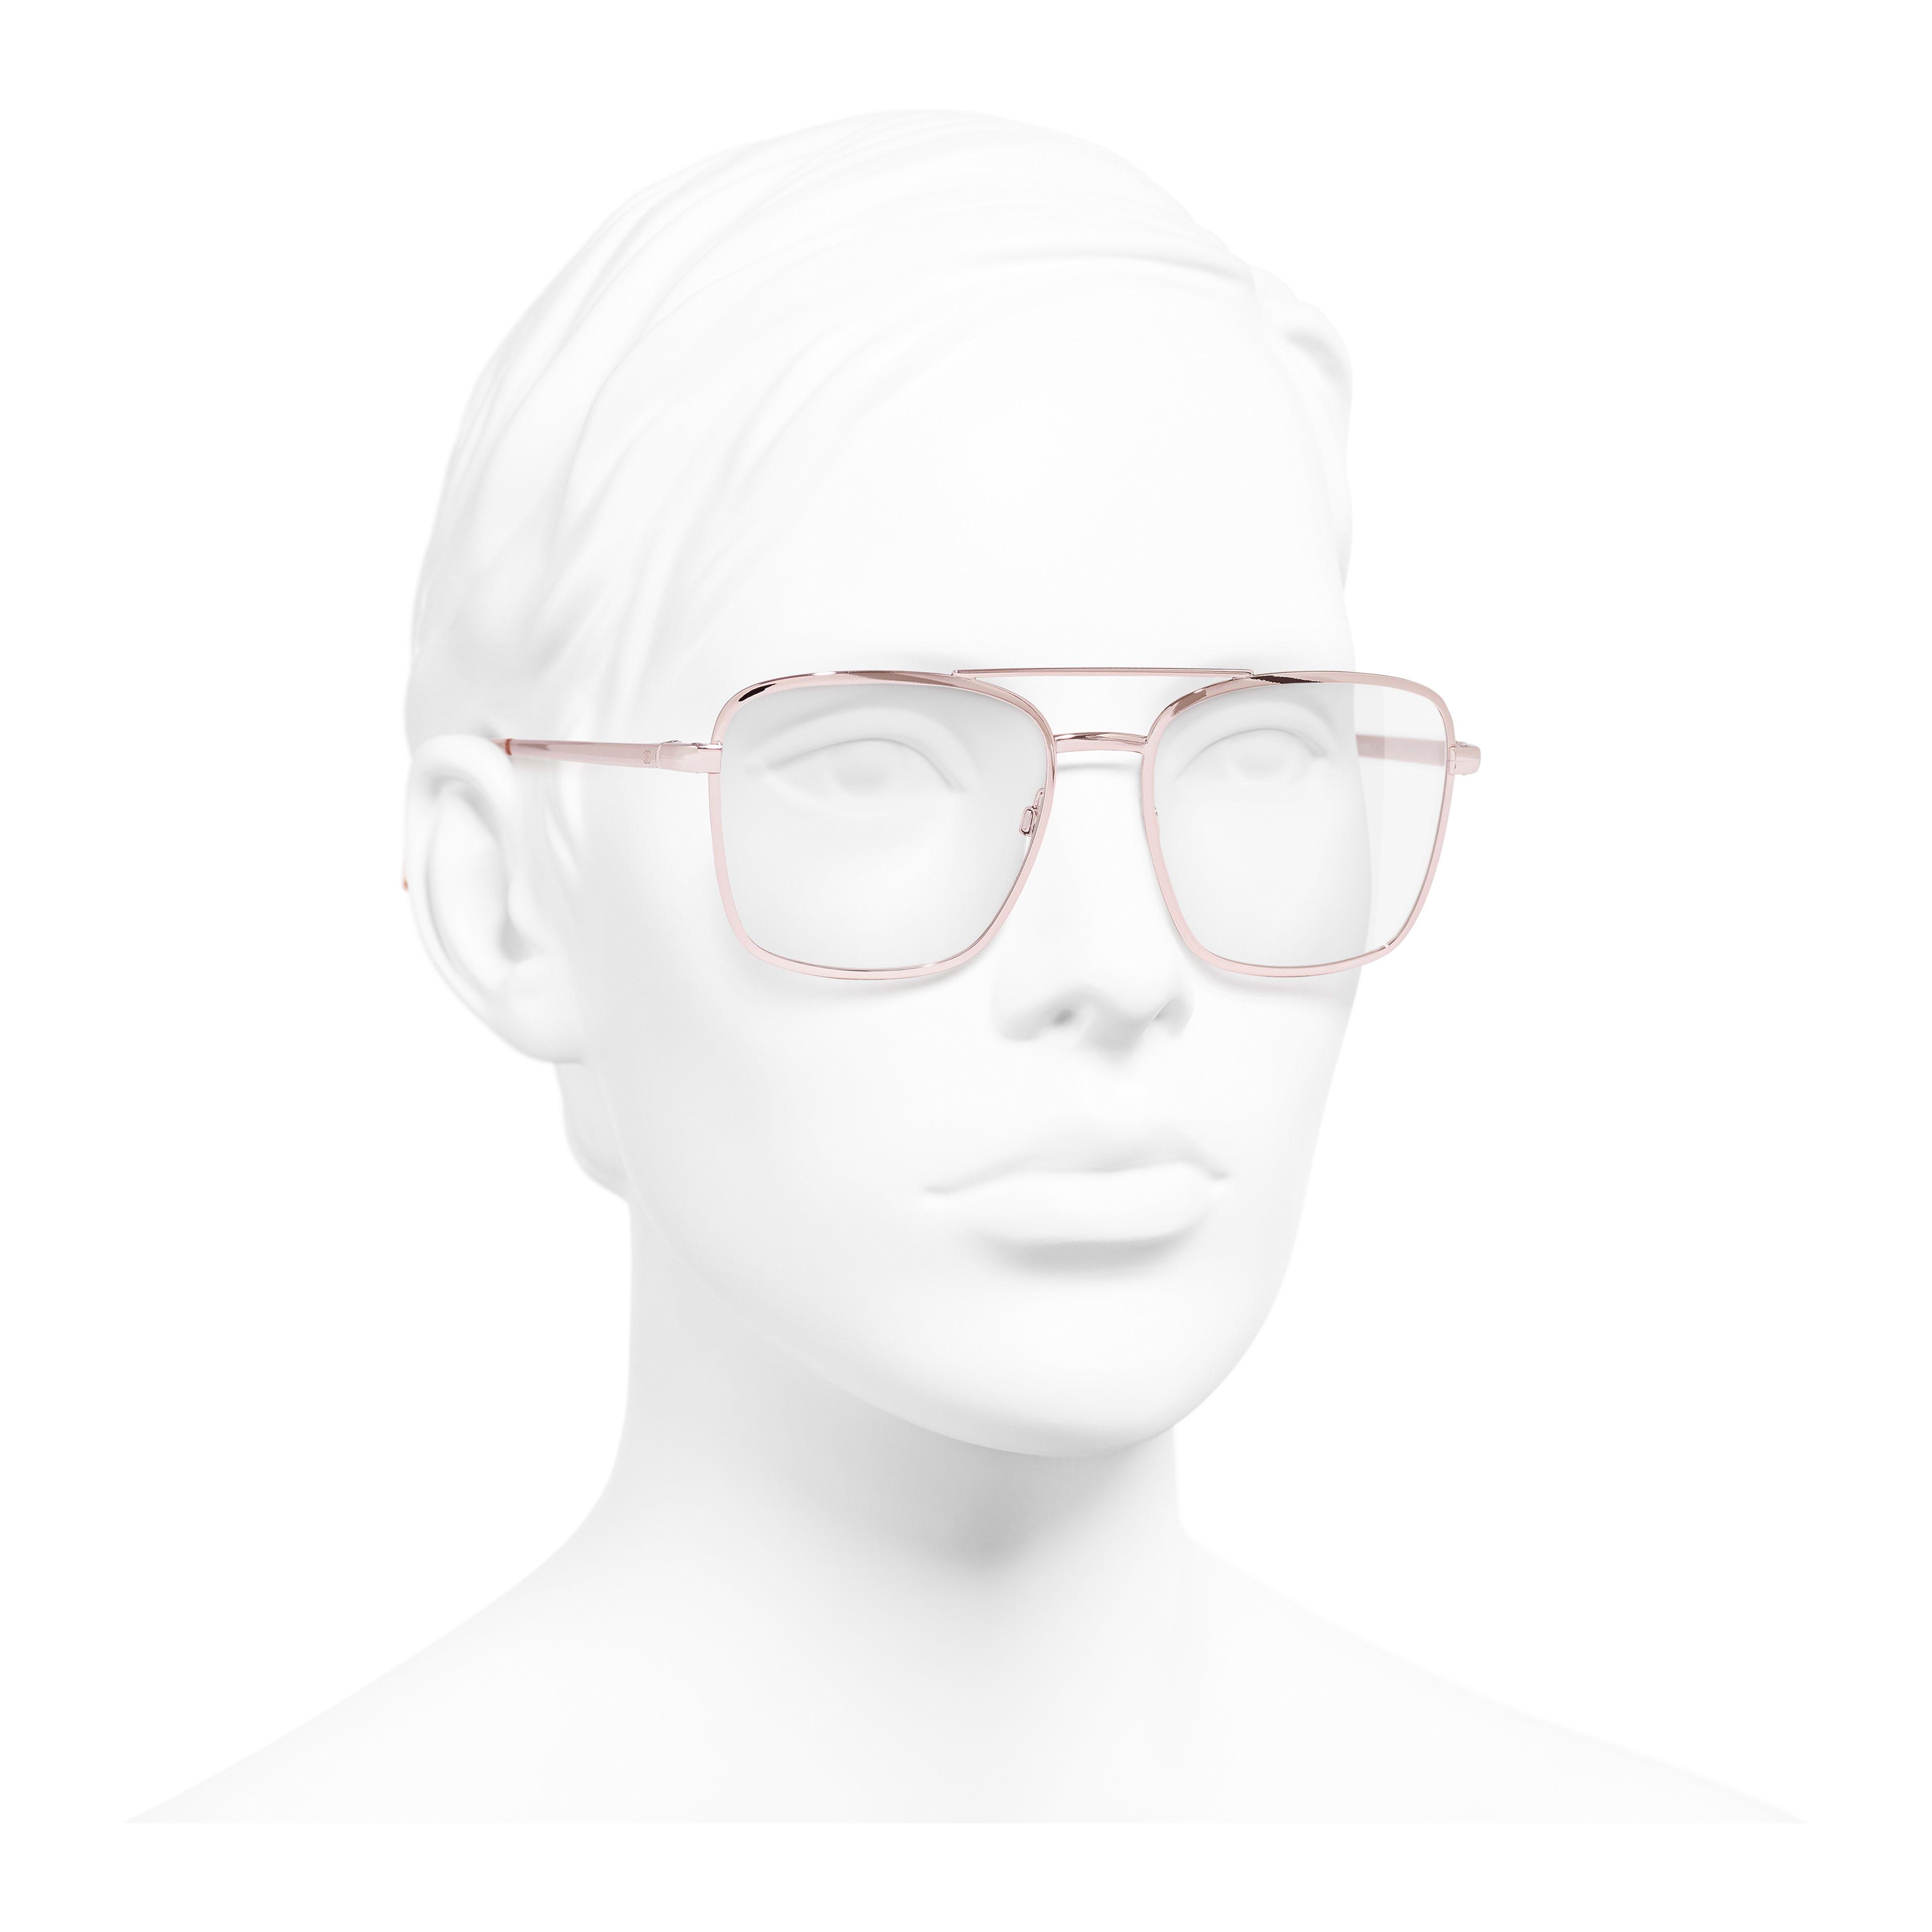 Pilot Eyeglasses Metal Pink Gold - - see full sized version